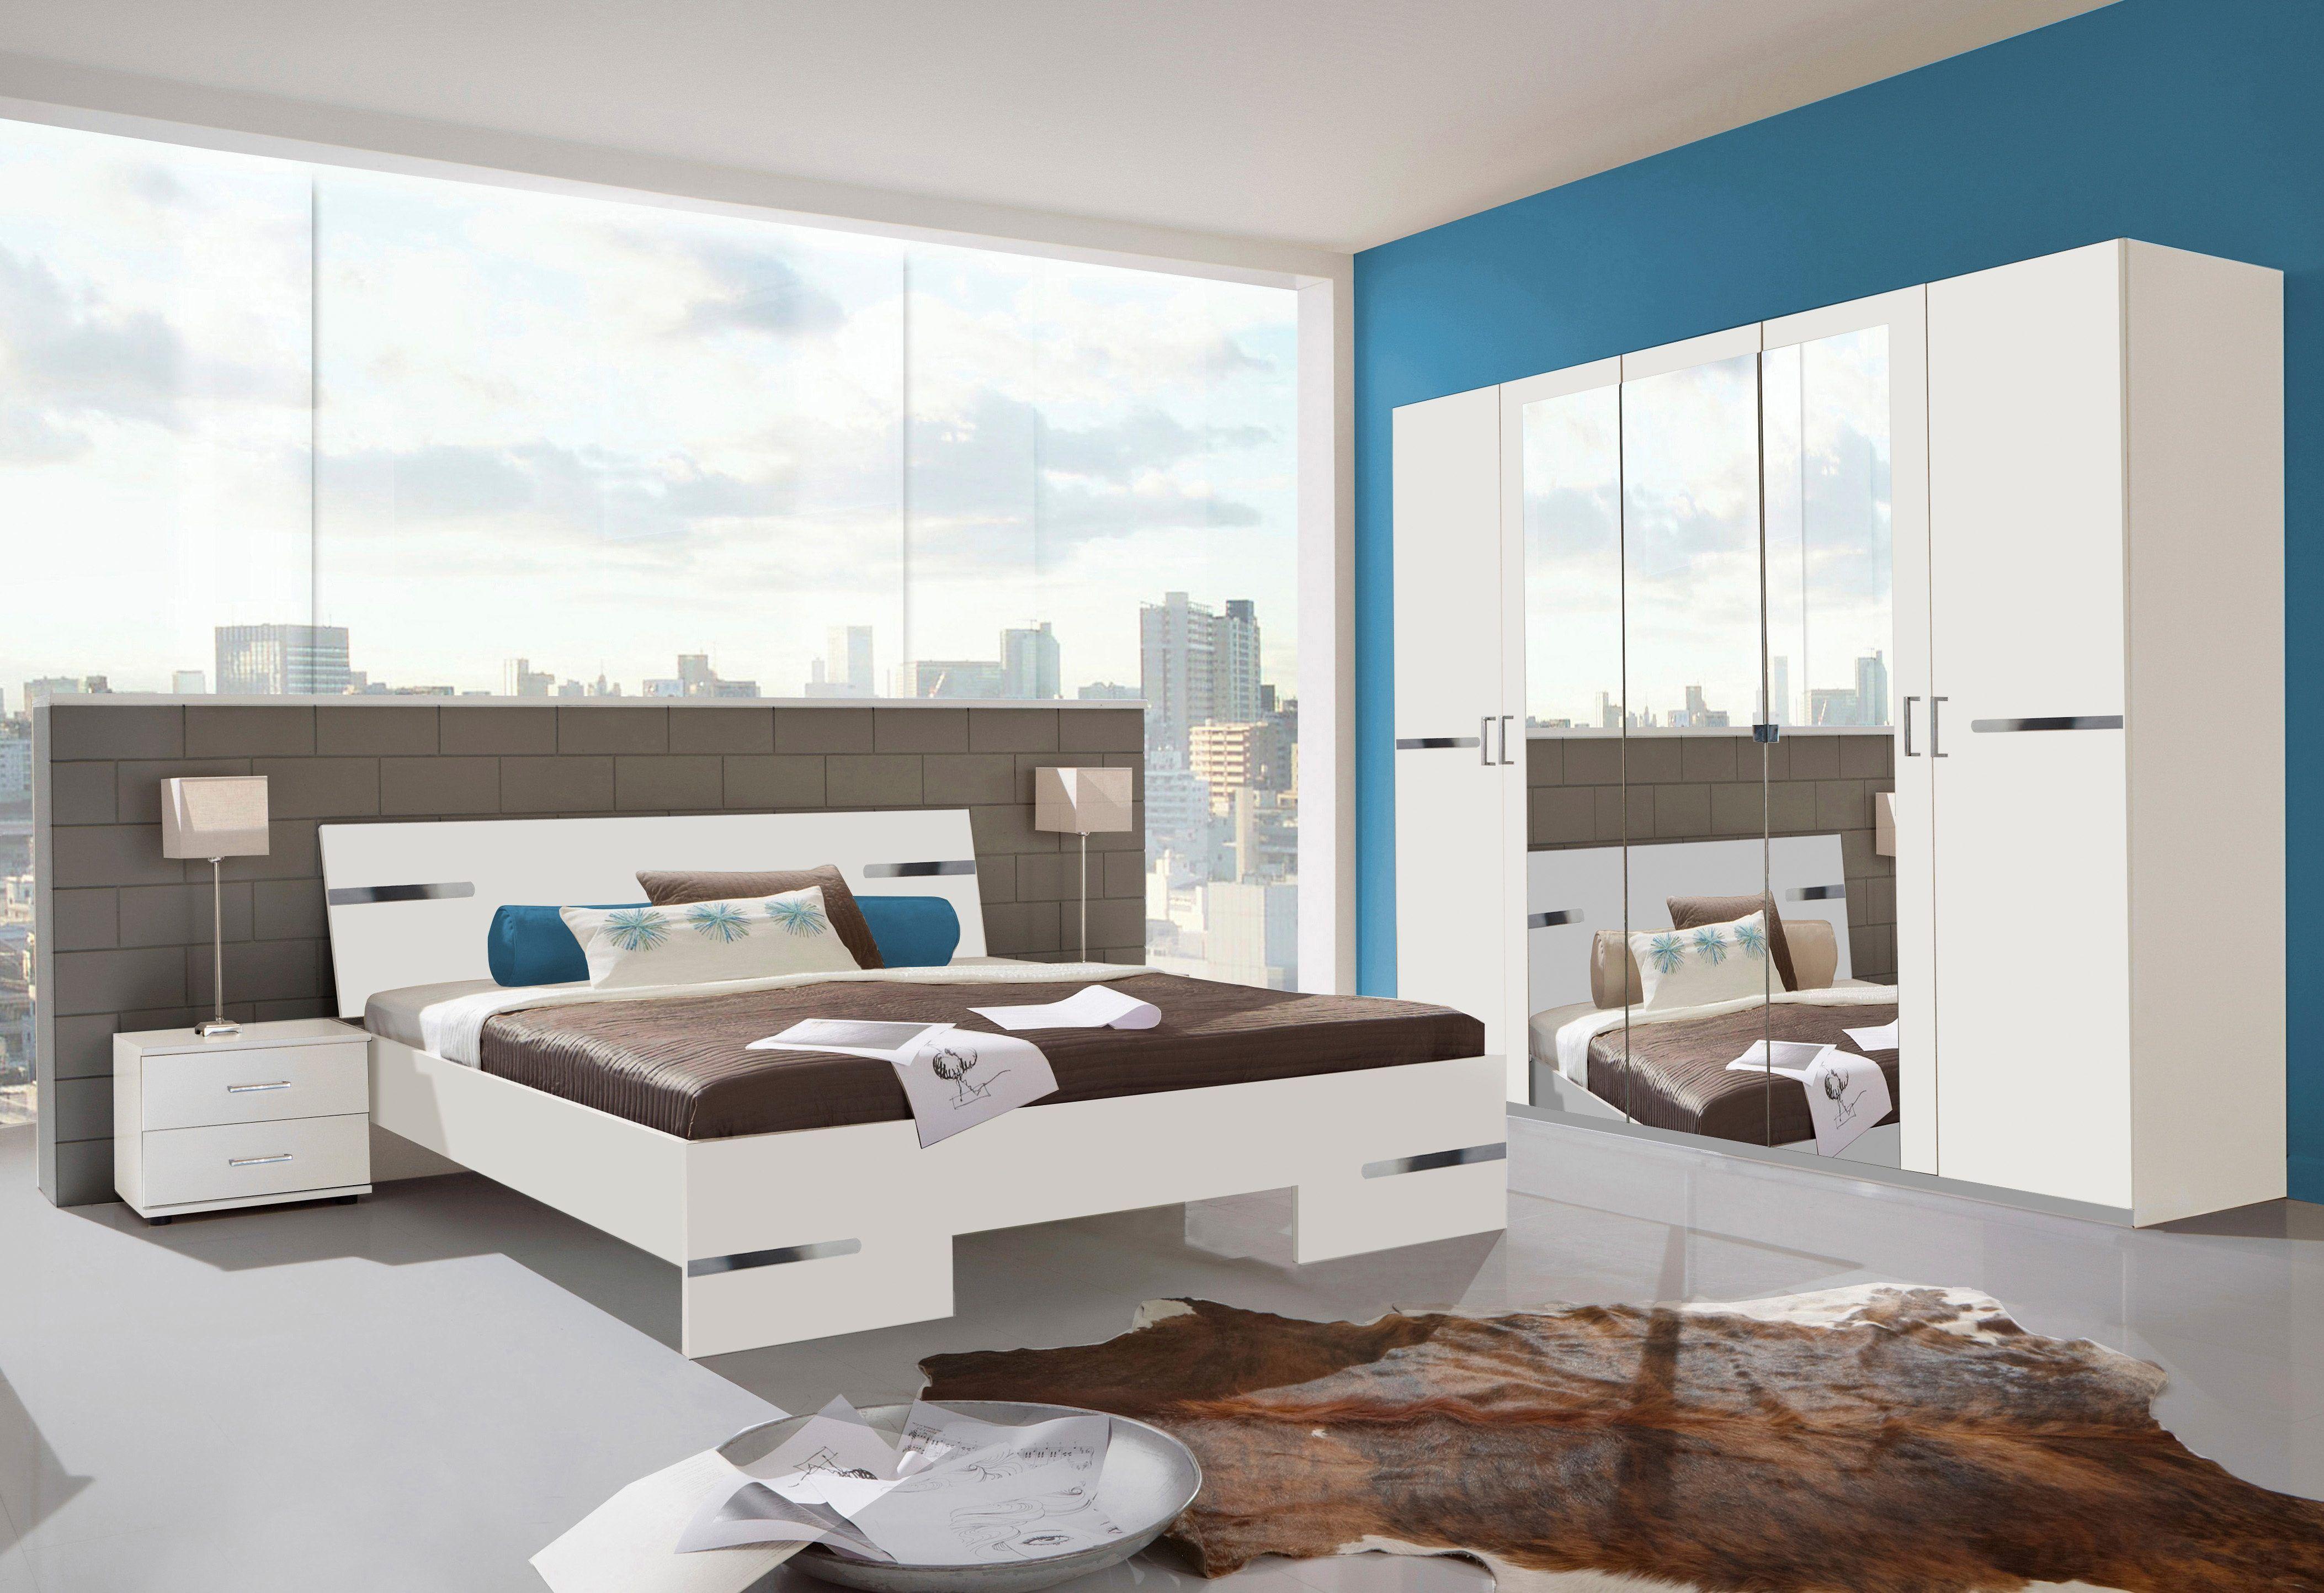 schlafzimmer set m bel stubenwagen bettw sche bettdecken welches material wandgestaltung. Black Bedroom Furniture Sets. Home Design Ideas